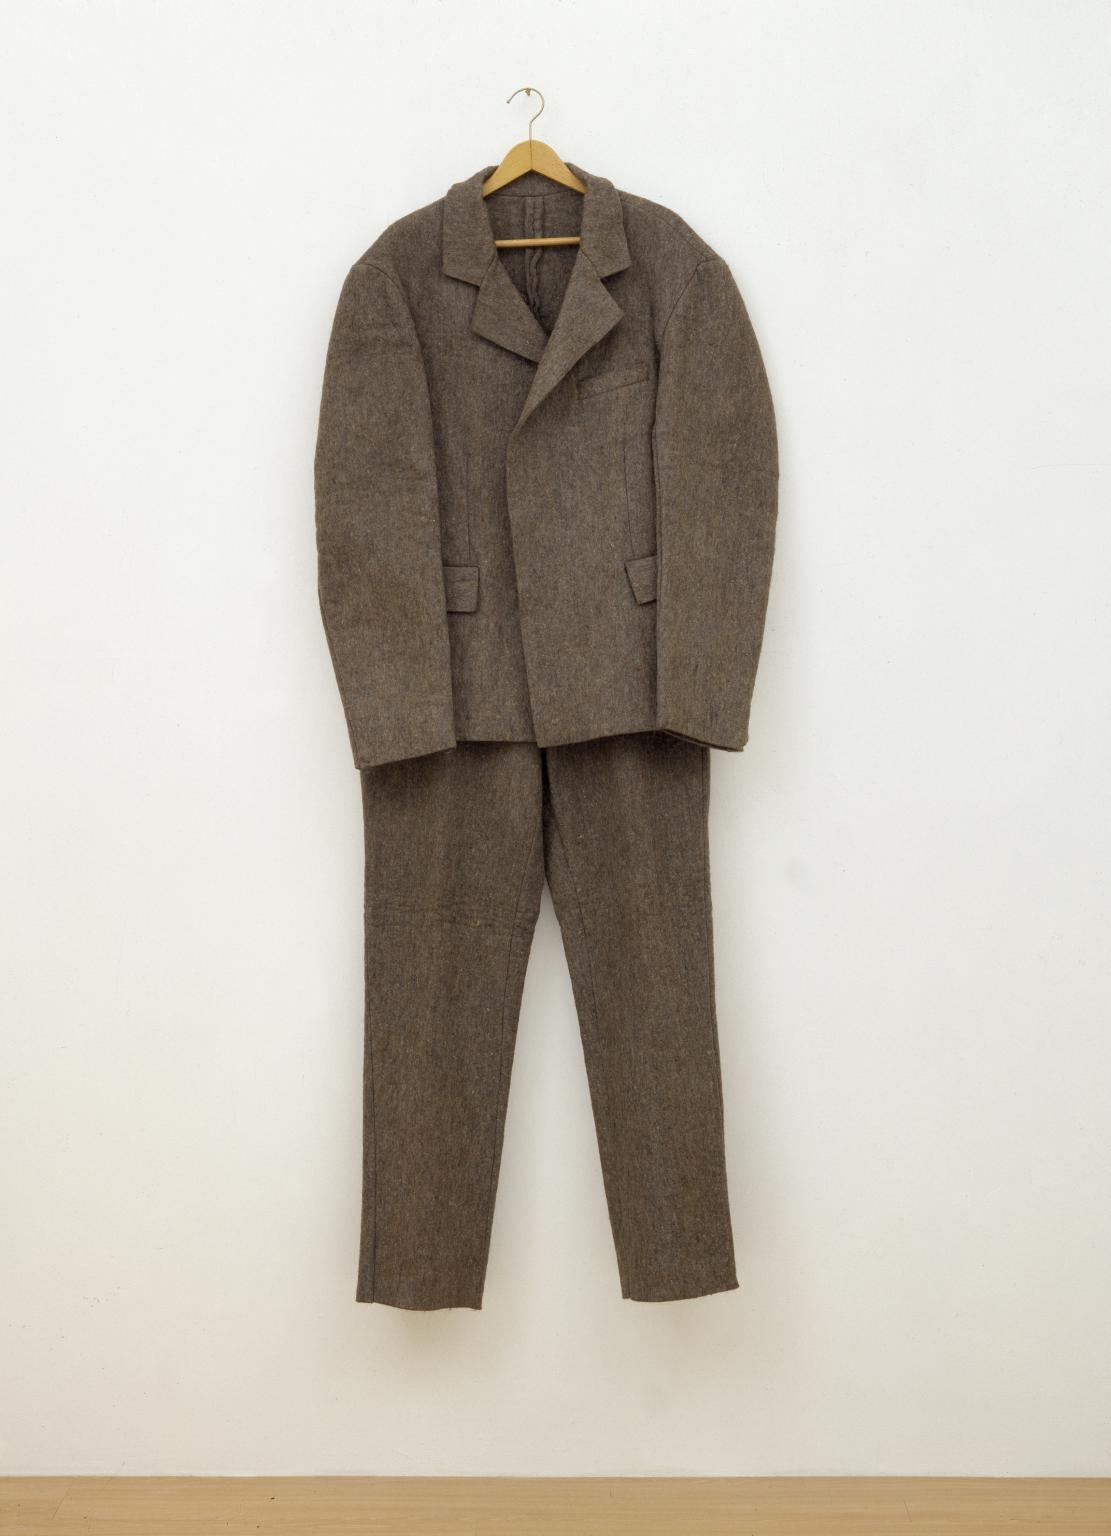 Joseph Beuys 'Felt Suit' 1970